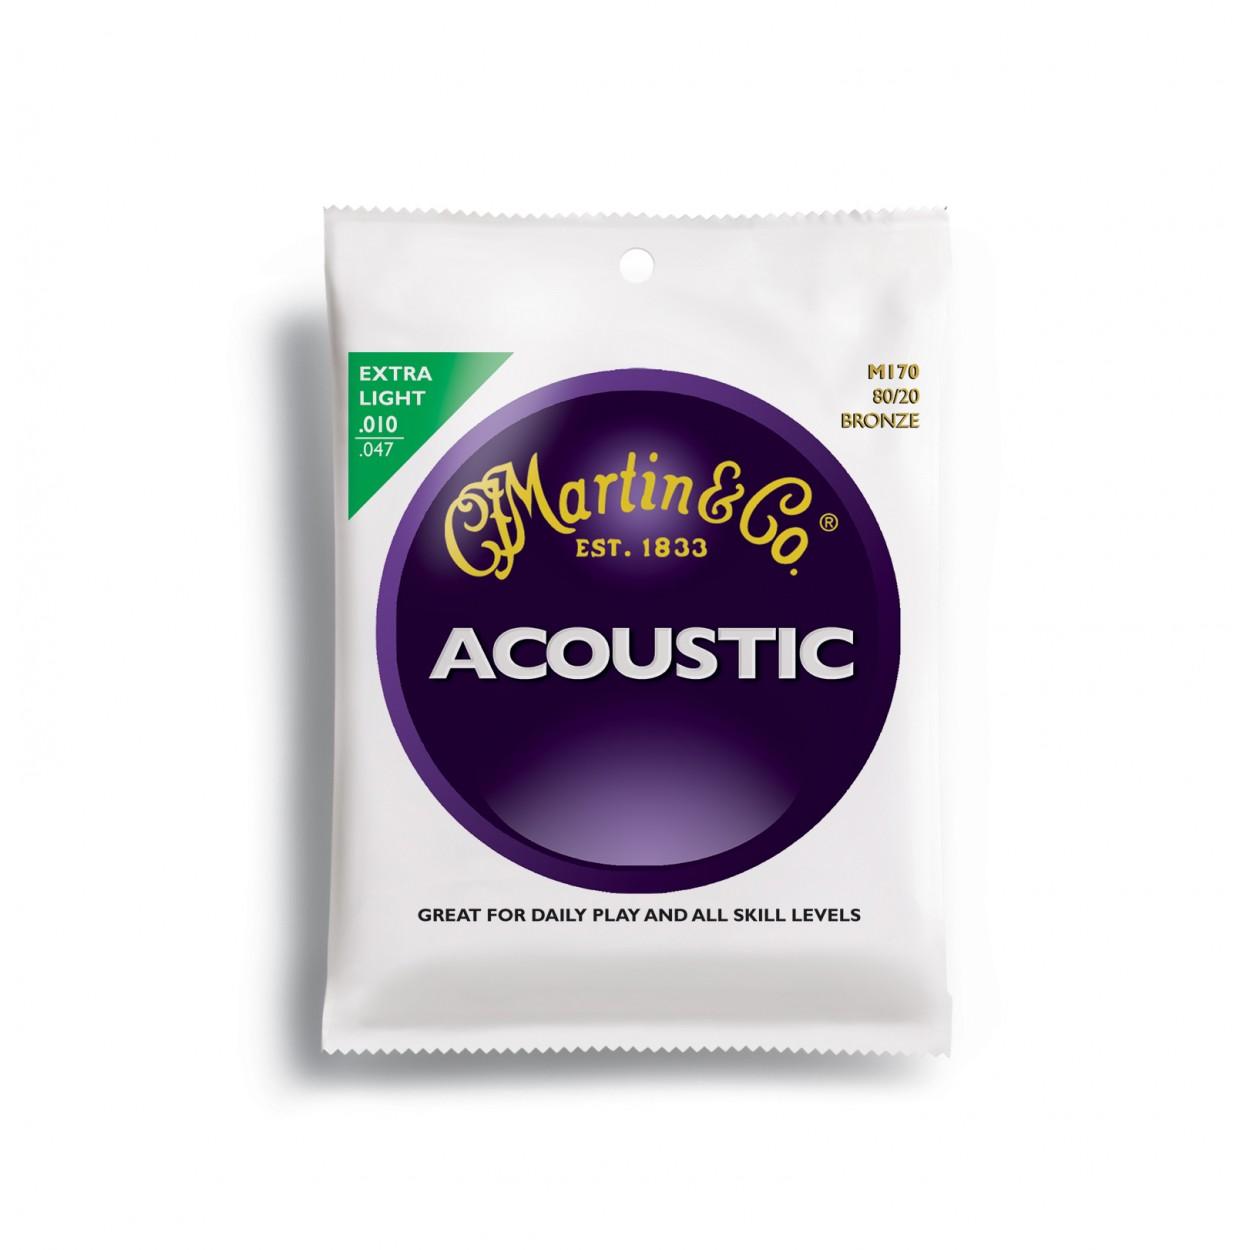 Martin Acoustic Guitar Strings Extra Light 10-47